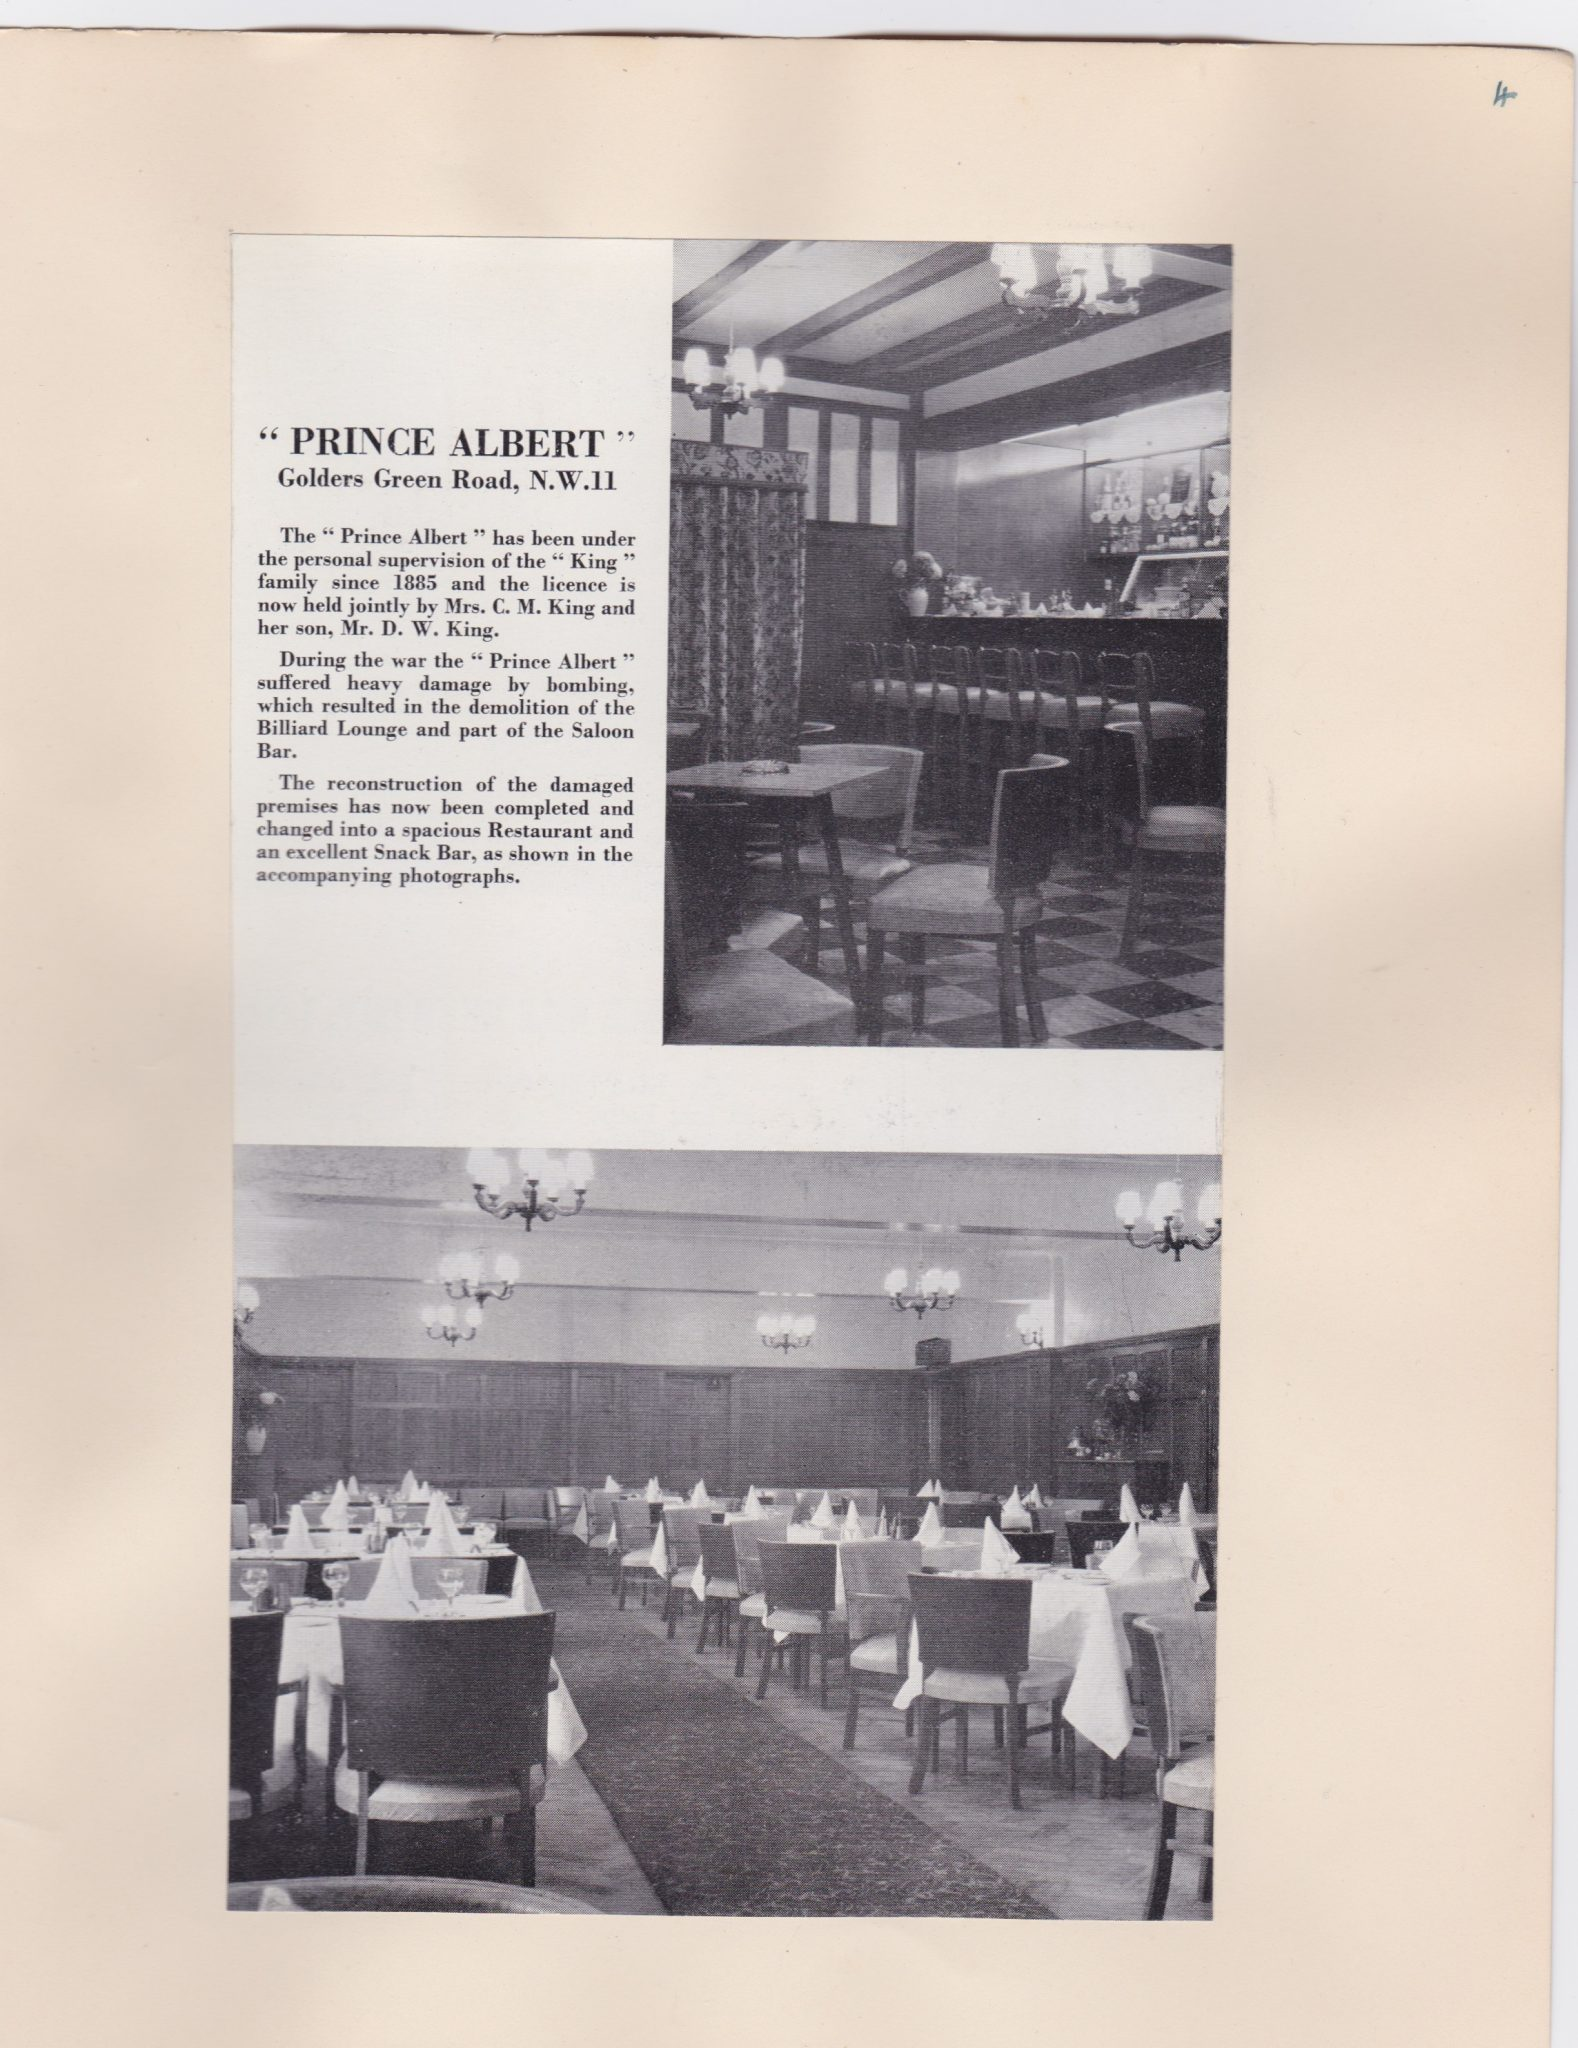 Prince Albert Pub Golders Green Road 1956